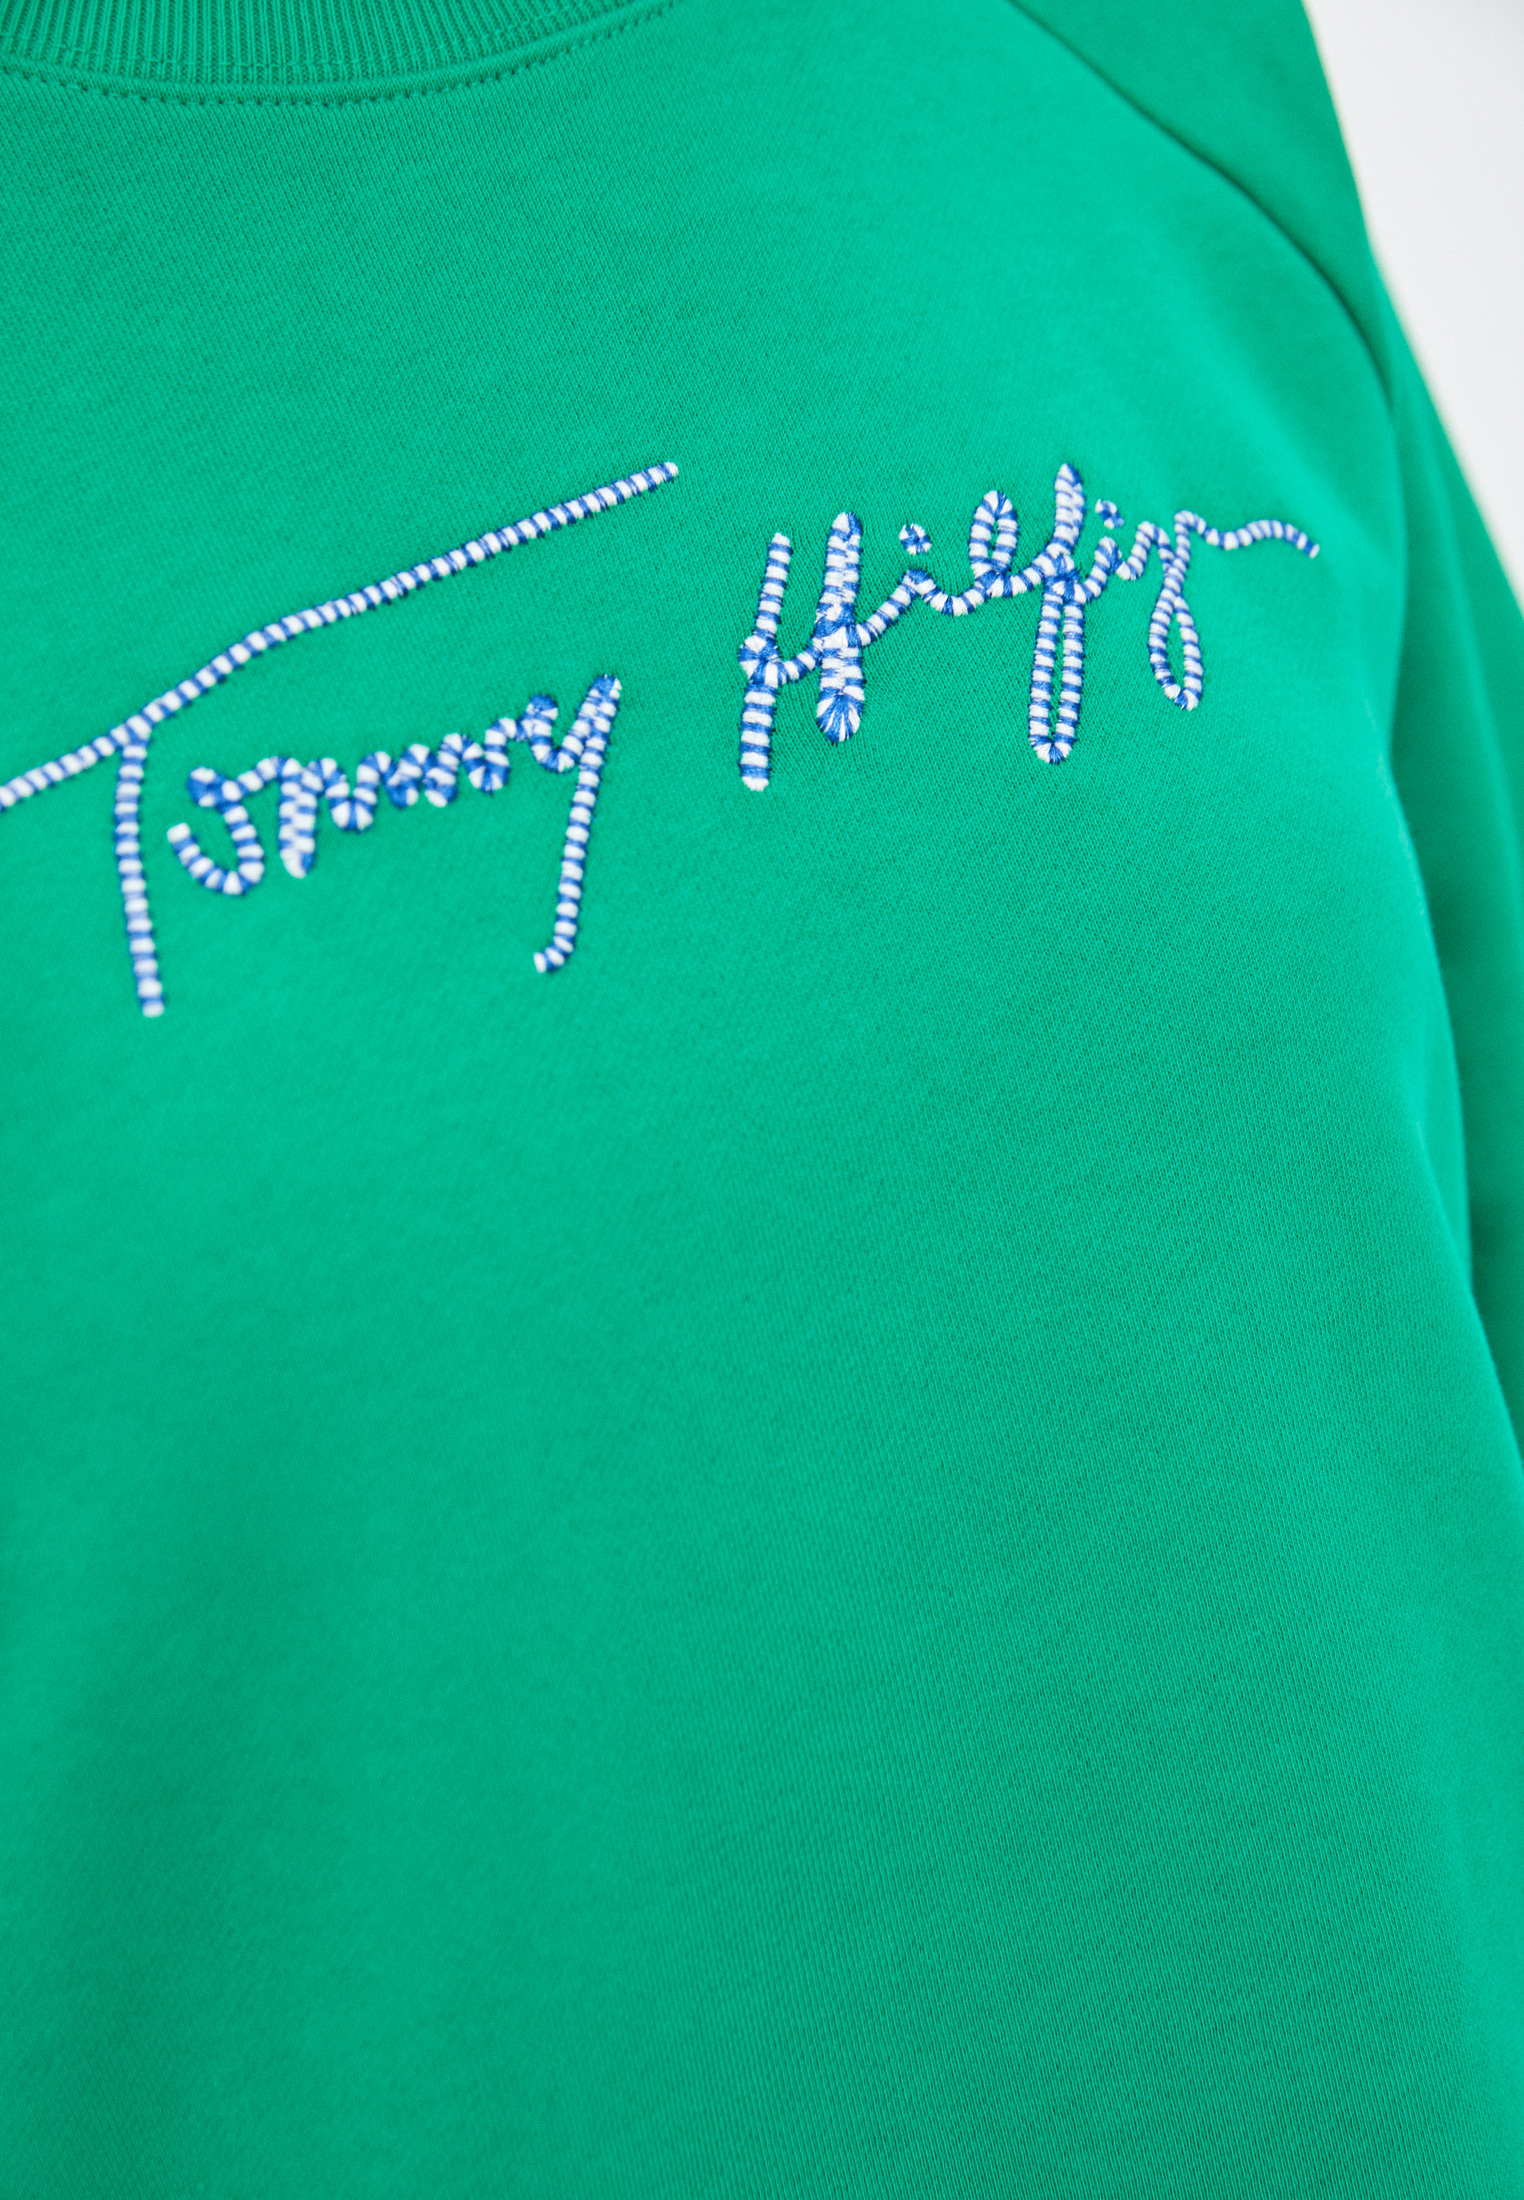 Свитер Tommy Hilfiger (Томми Хилфигер) WW0WW29432: изображение 4